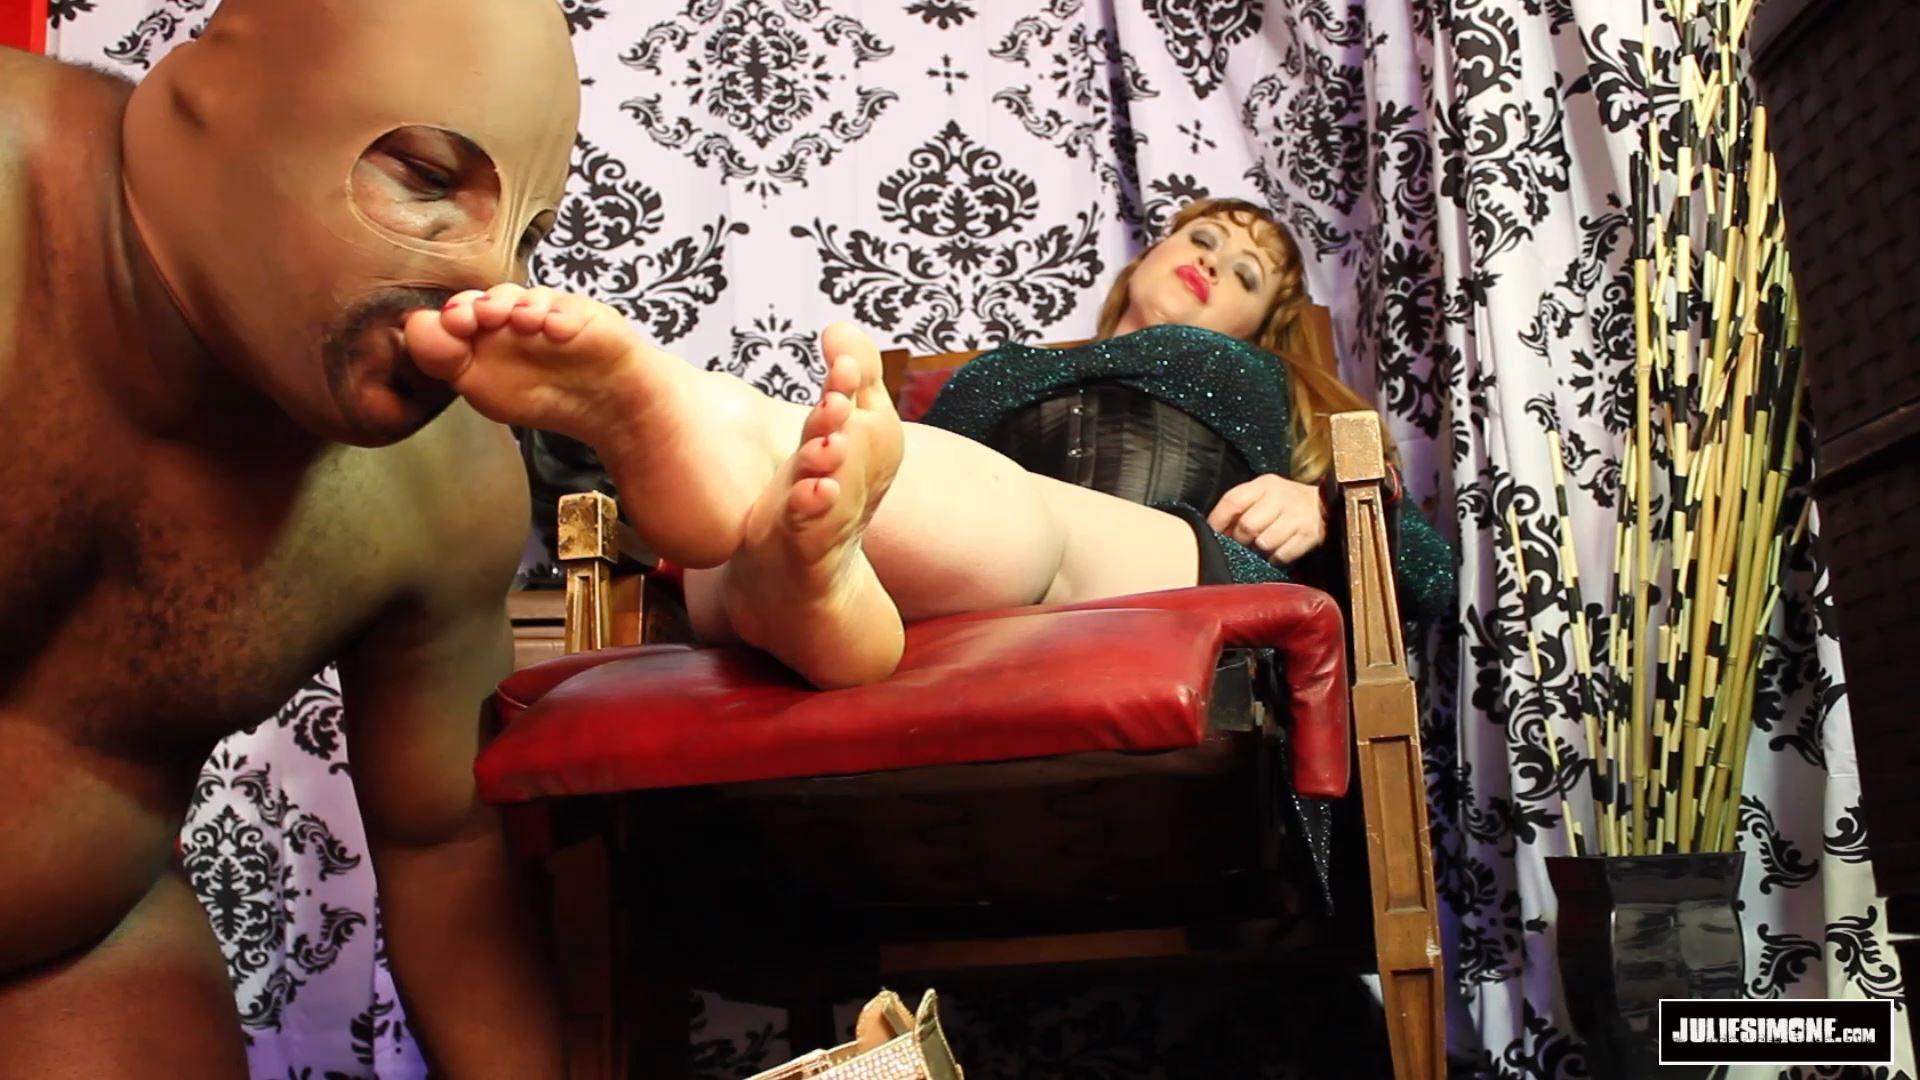 Julie Simone In Scene: Foot Worship Reward - JULIESIMONE - FULL HD/1080p/MP4